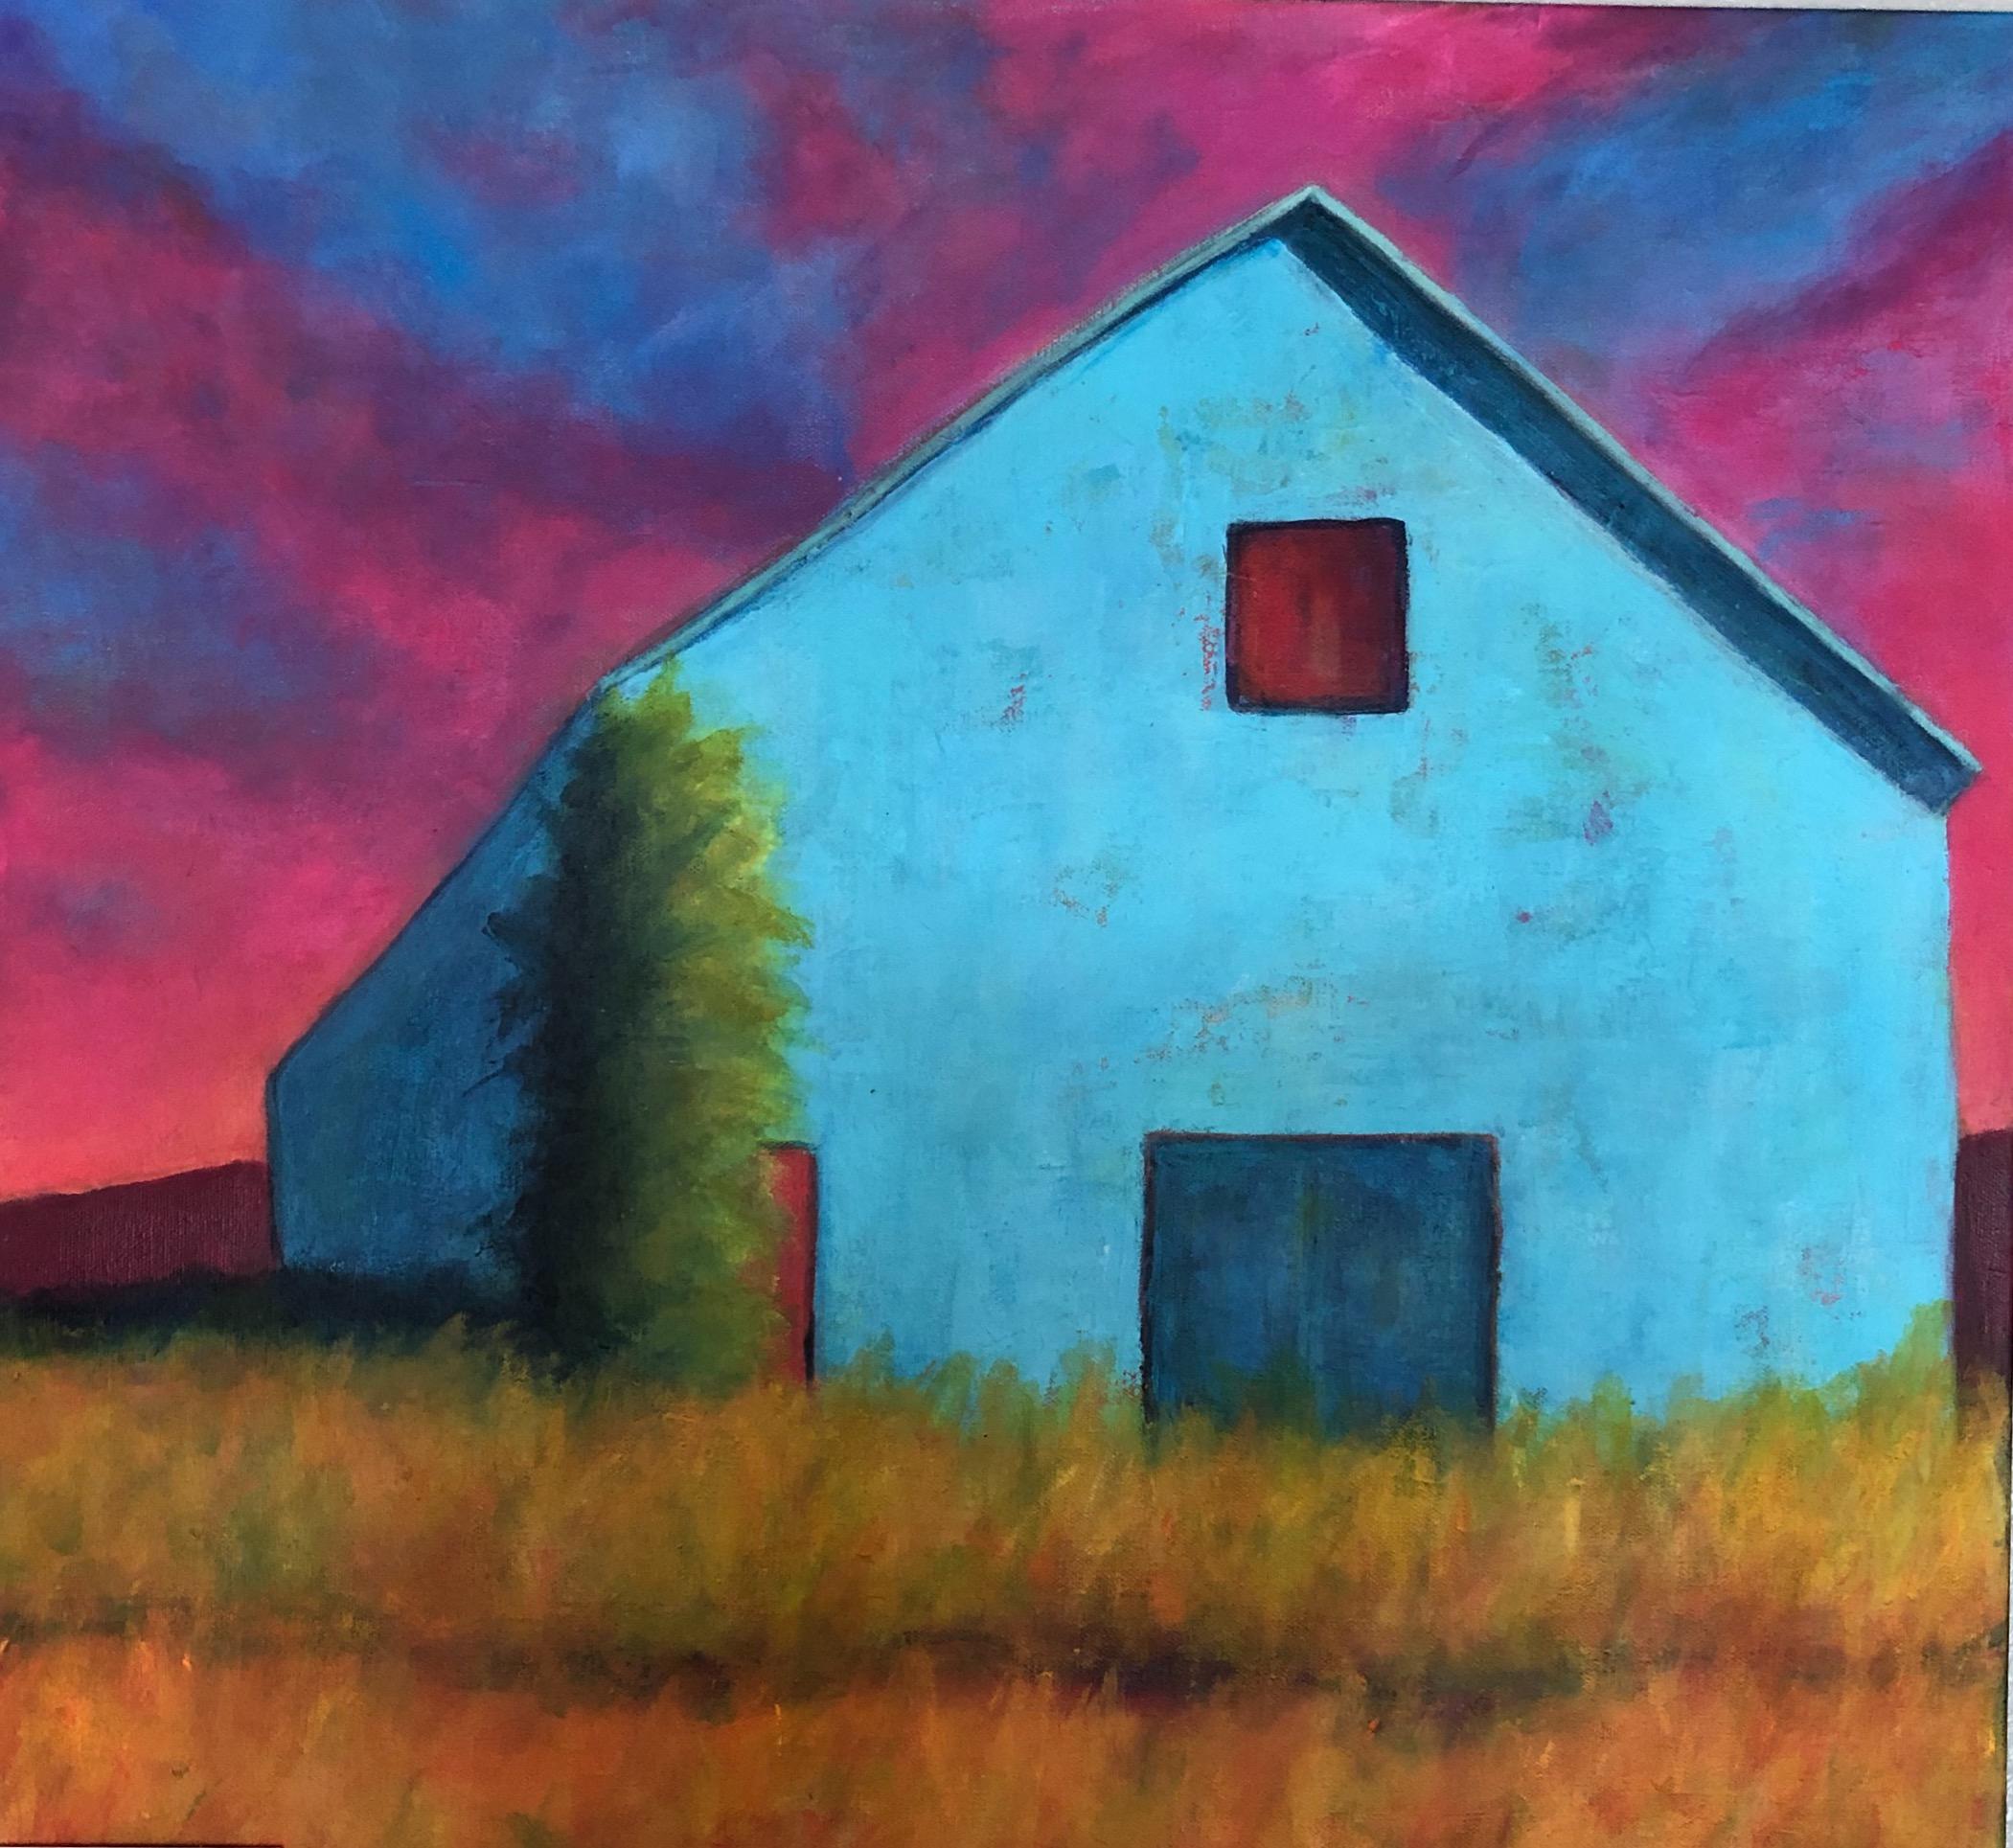 Blue Barn ~ Homage to Batchelder